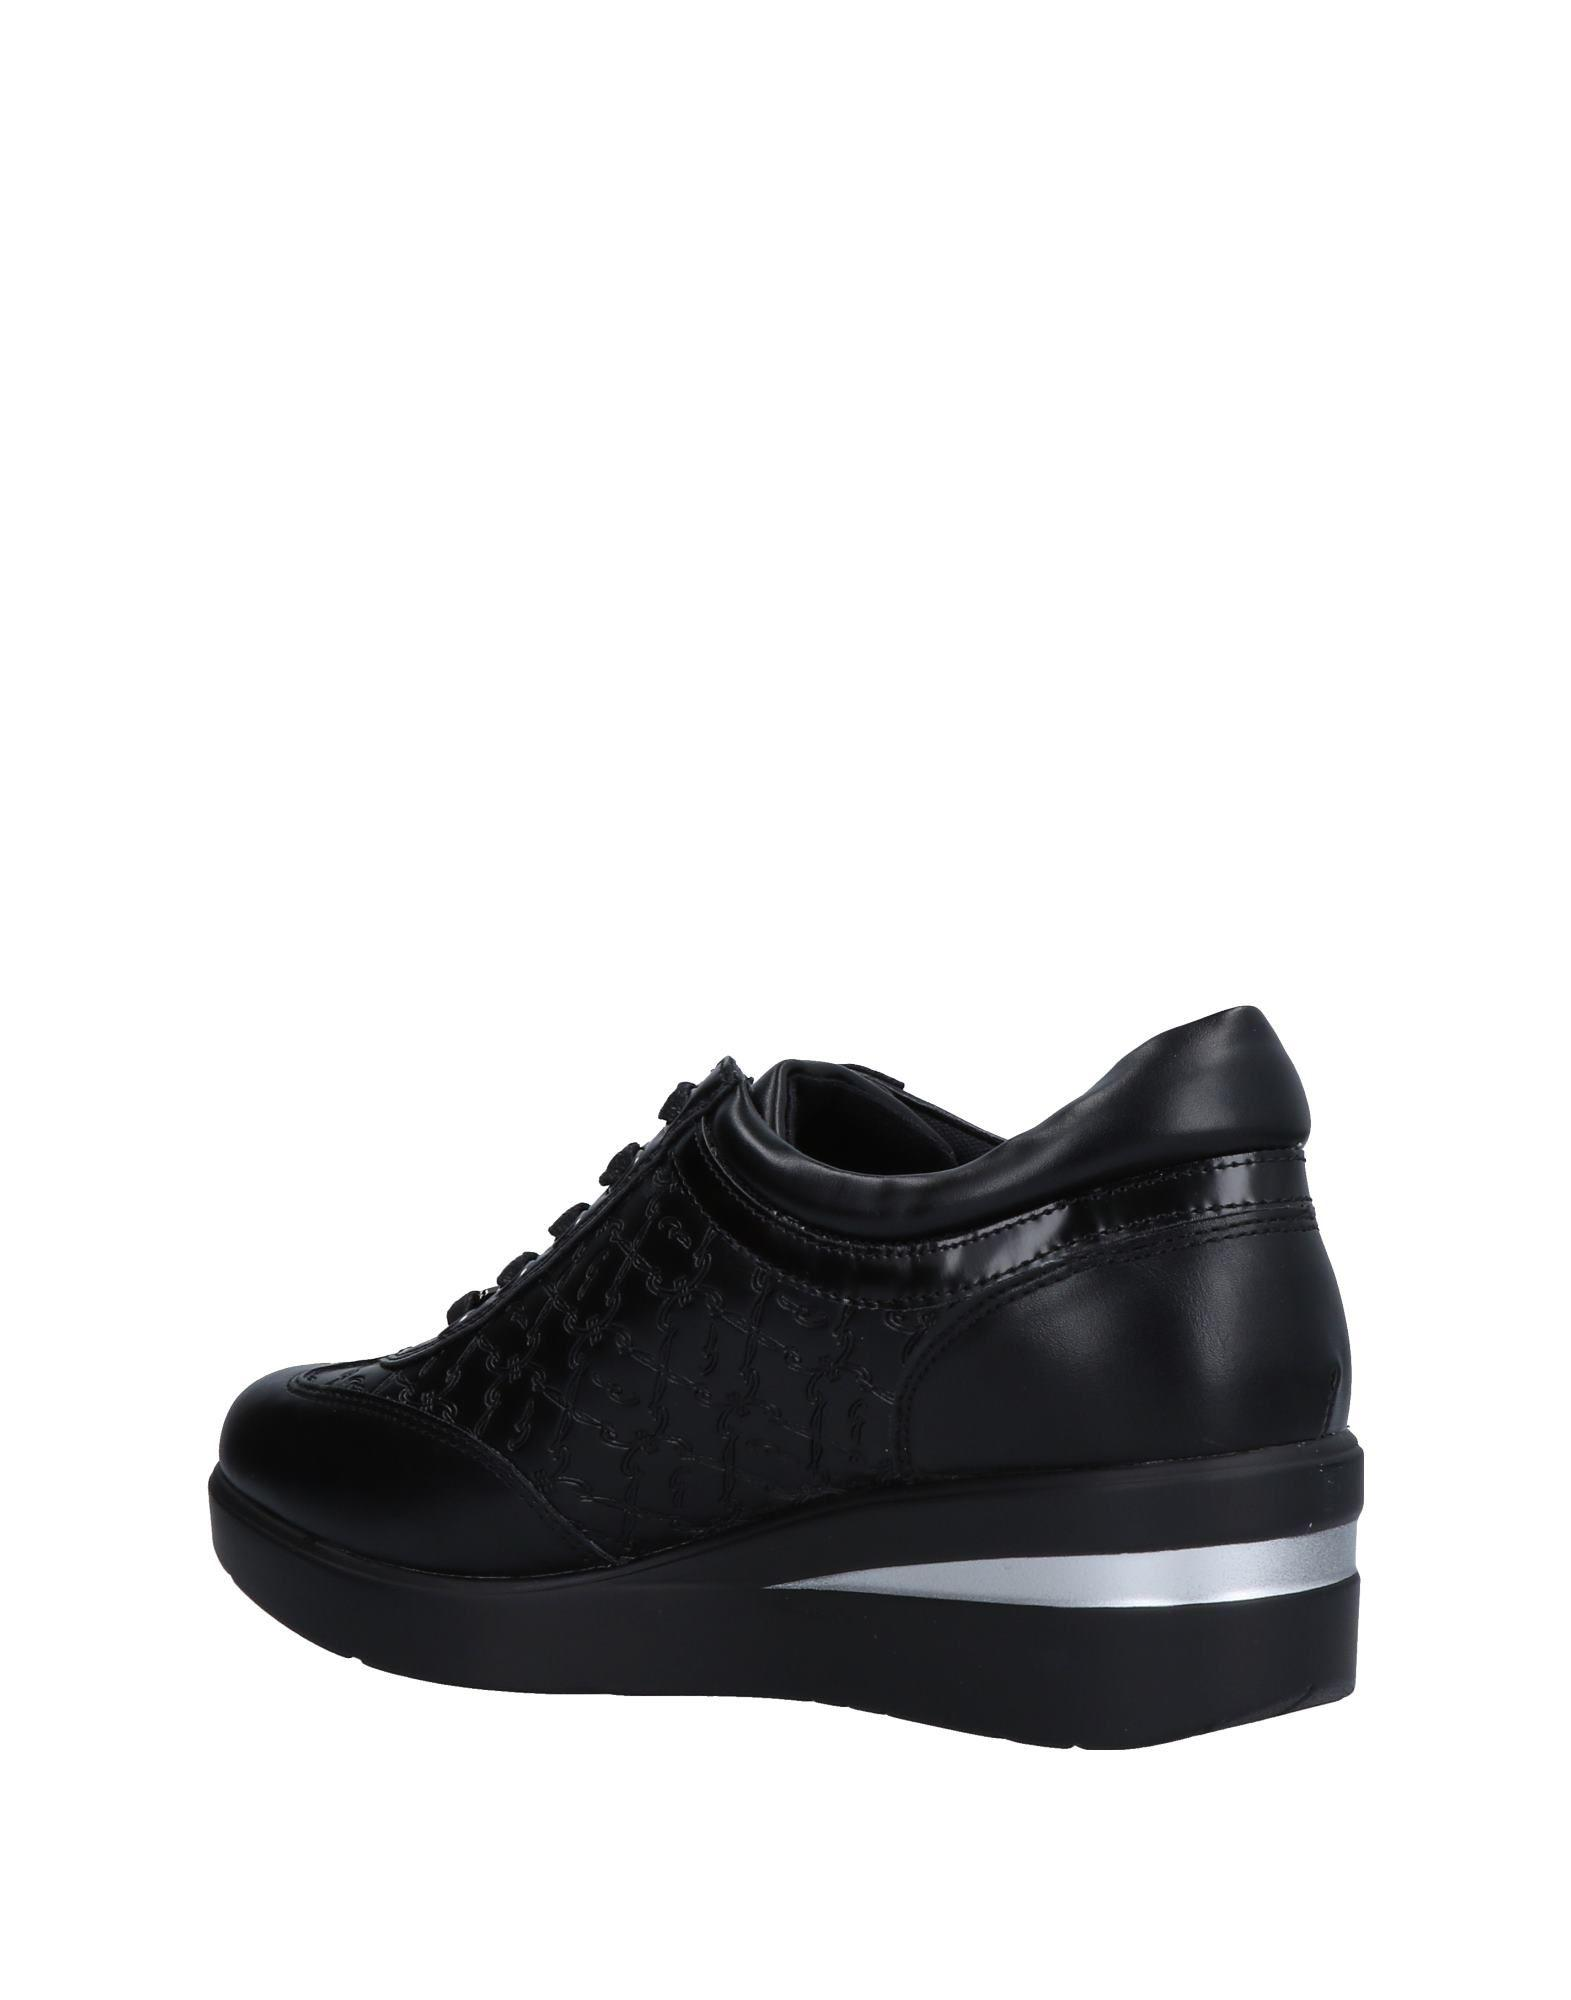 Gattinoni Low-tops & Sneakers in Black